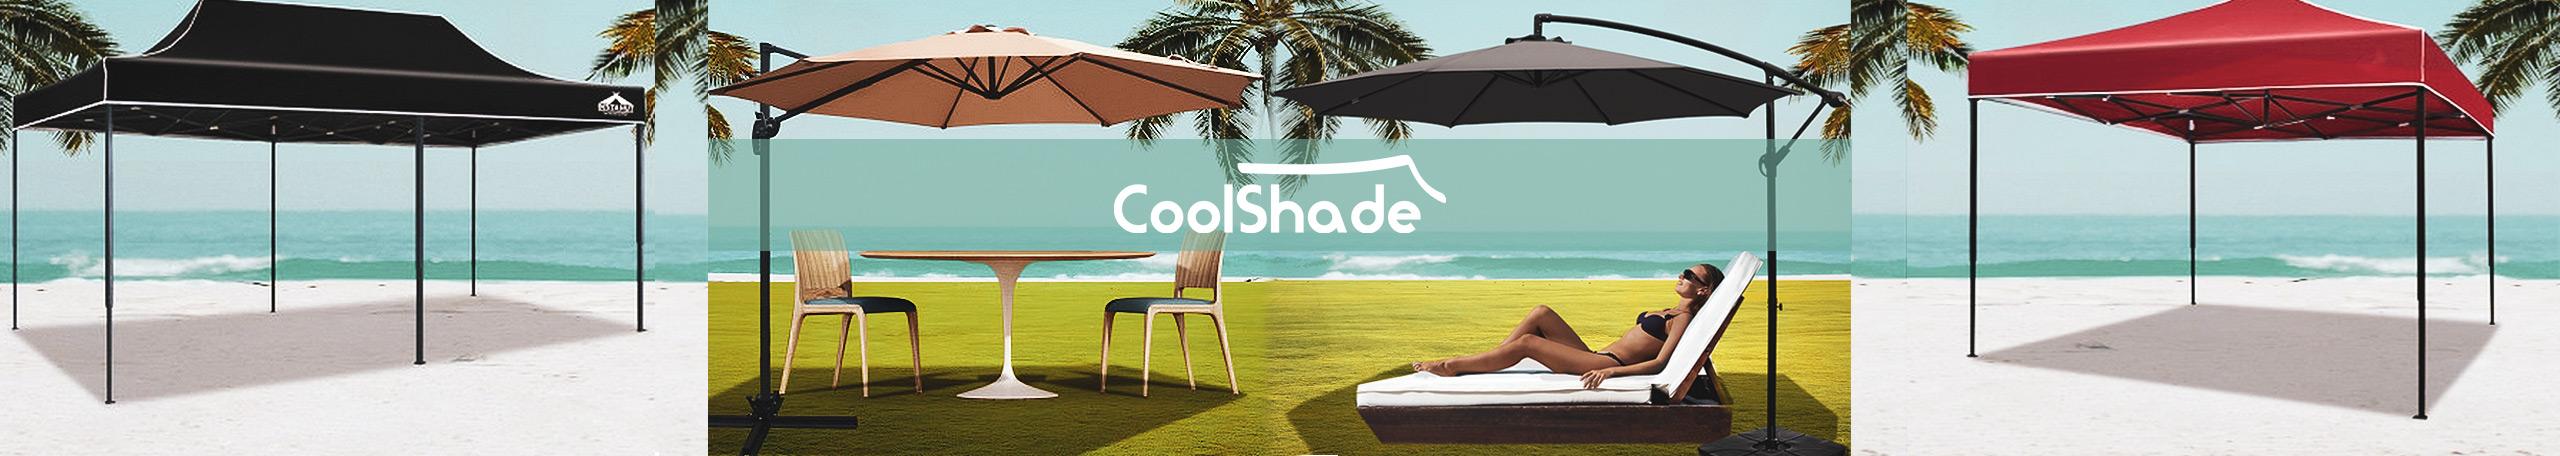 CoolShade